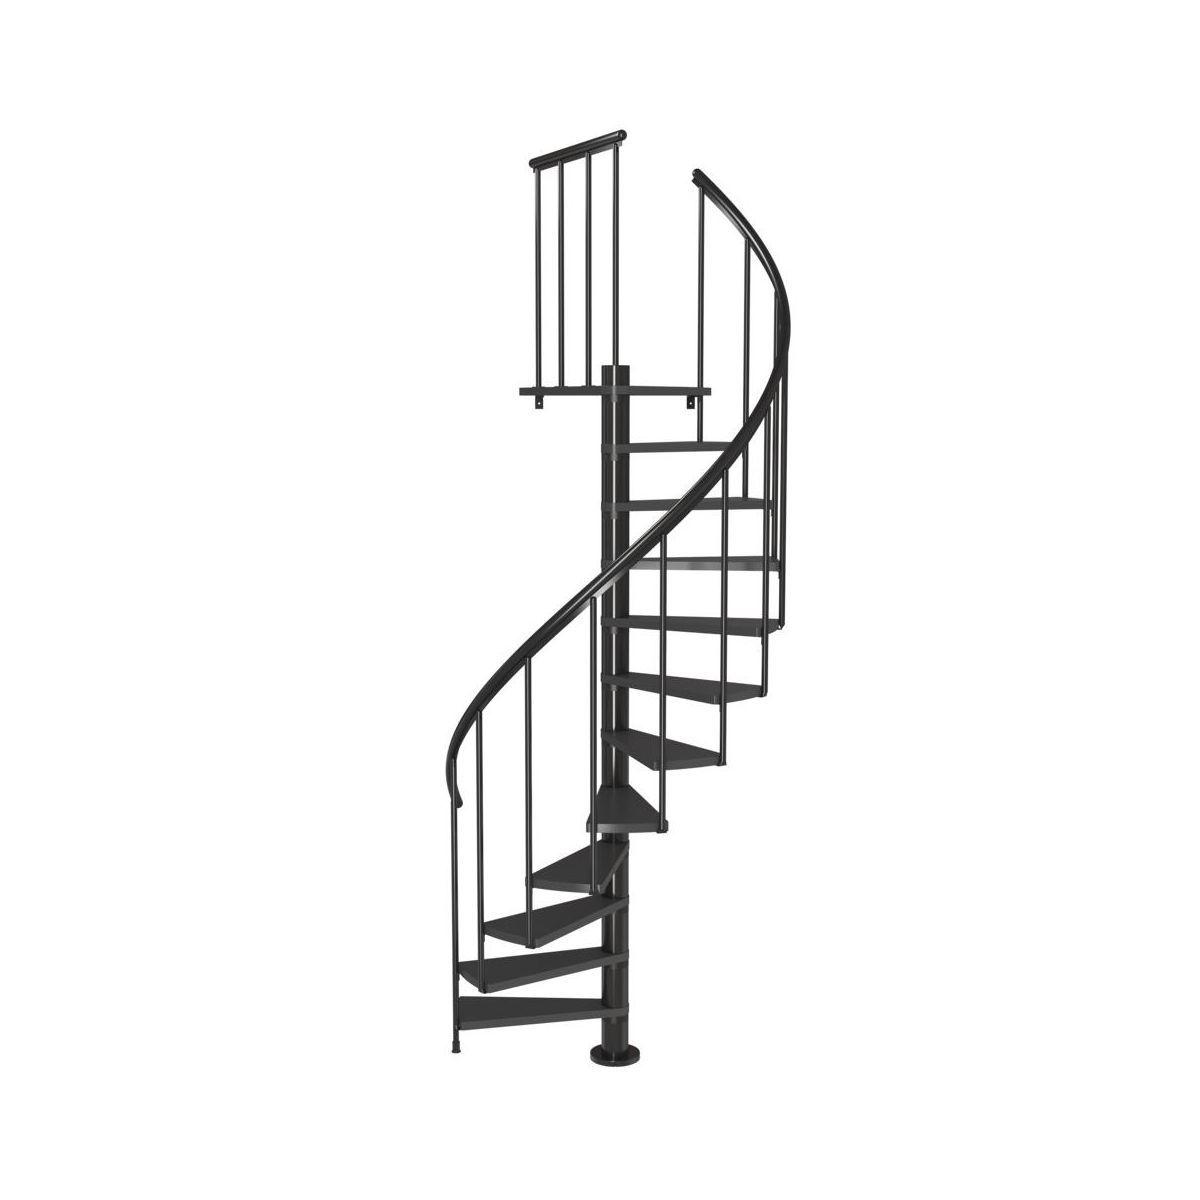 Schody Spiralne Calgary Antracytowe Dolle Spiral Staircase Spiral Stairs Spiral Staircase Kits